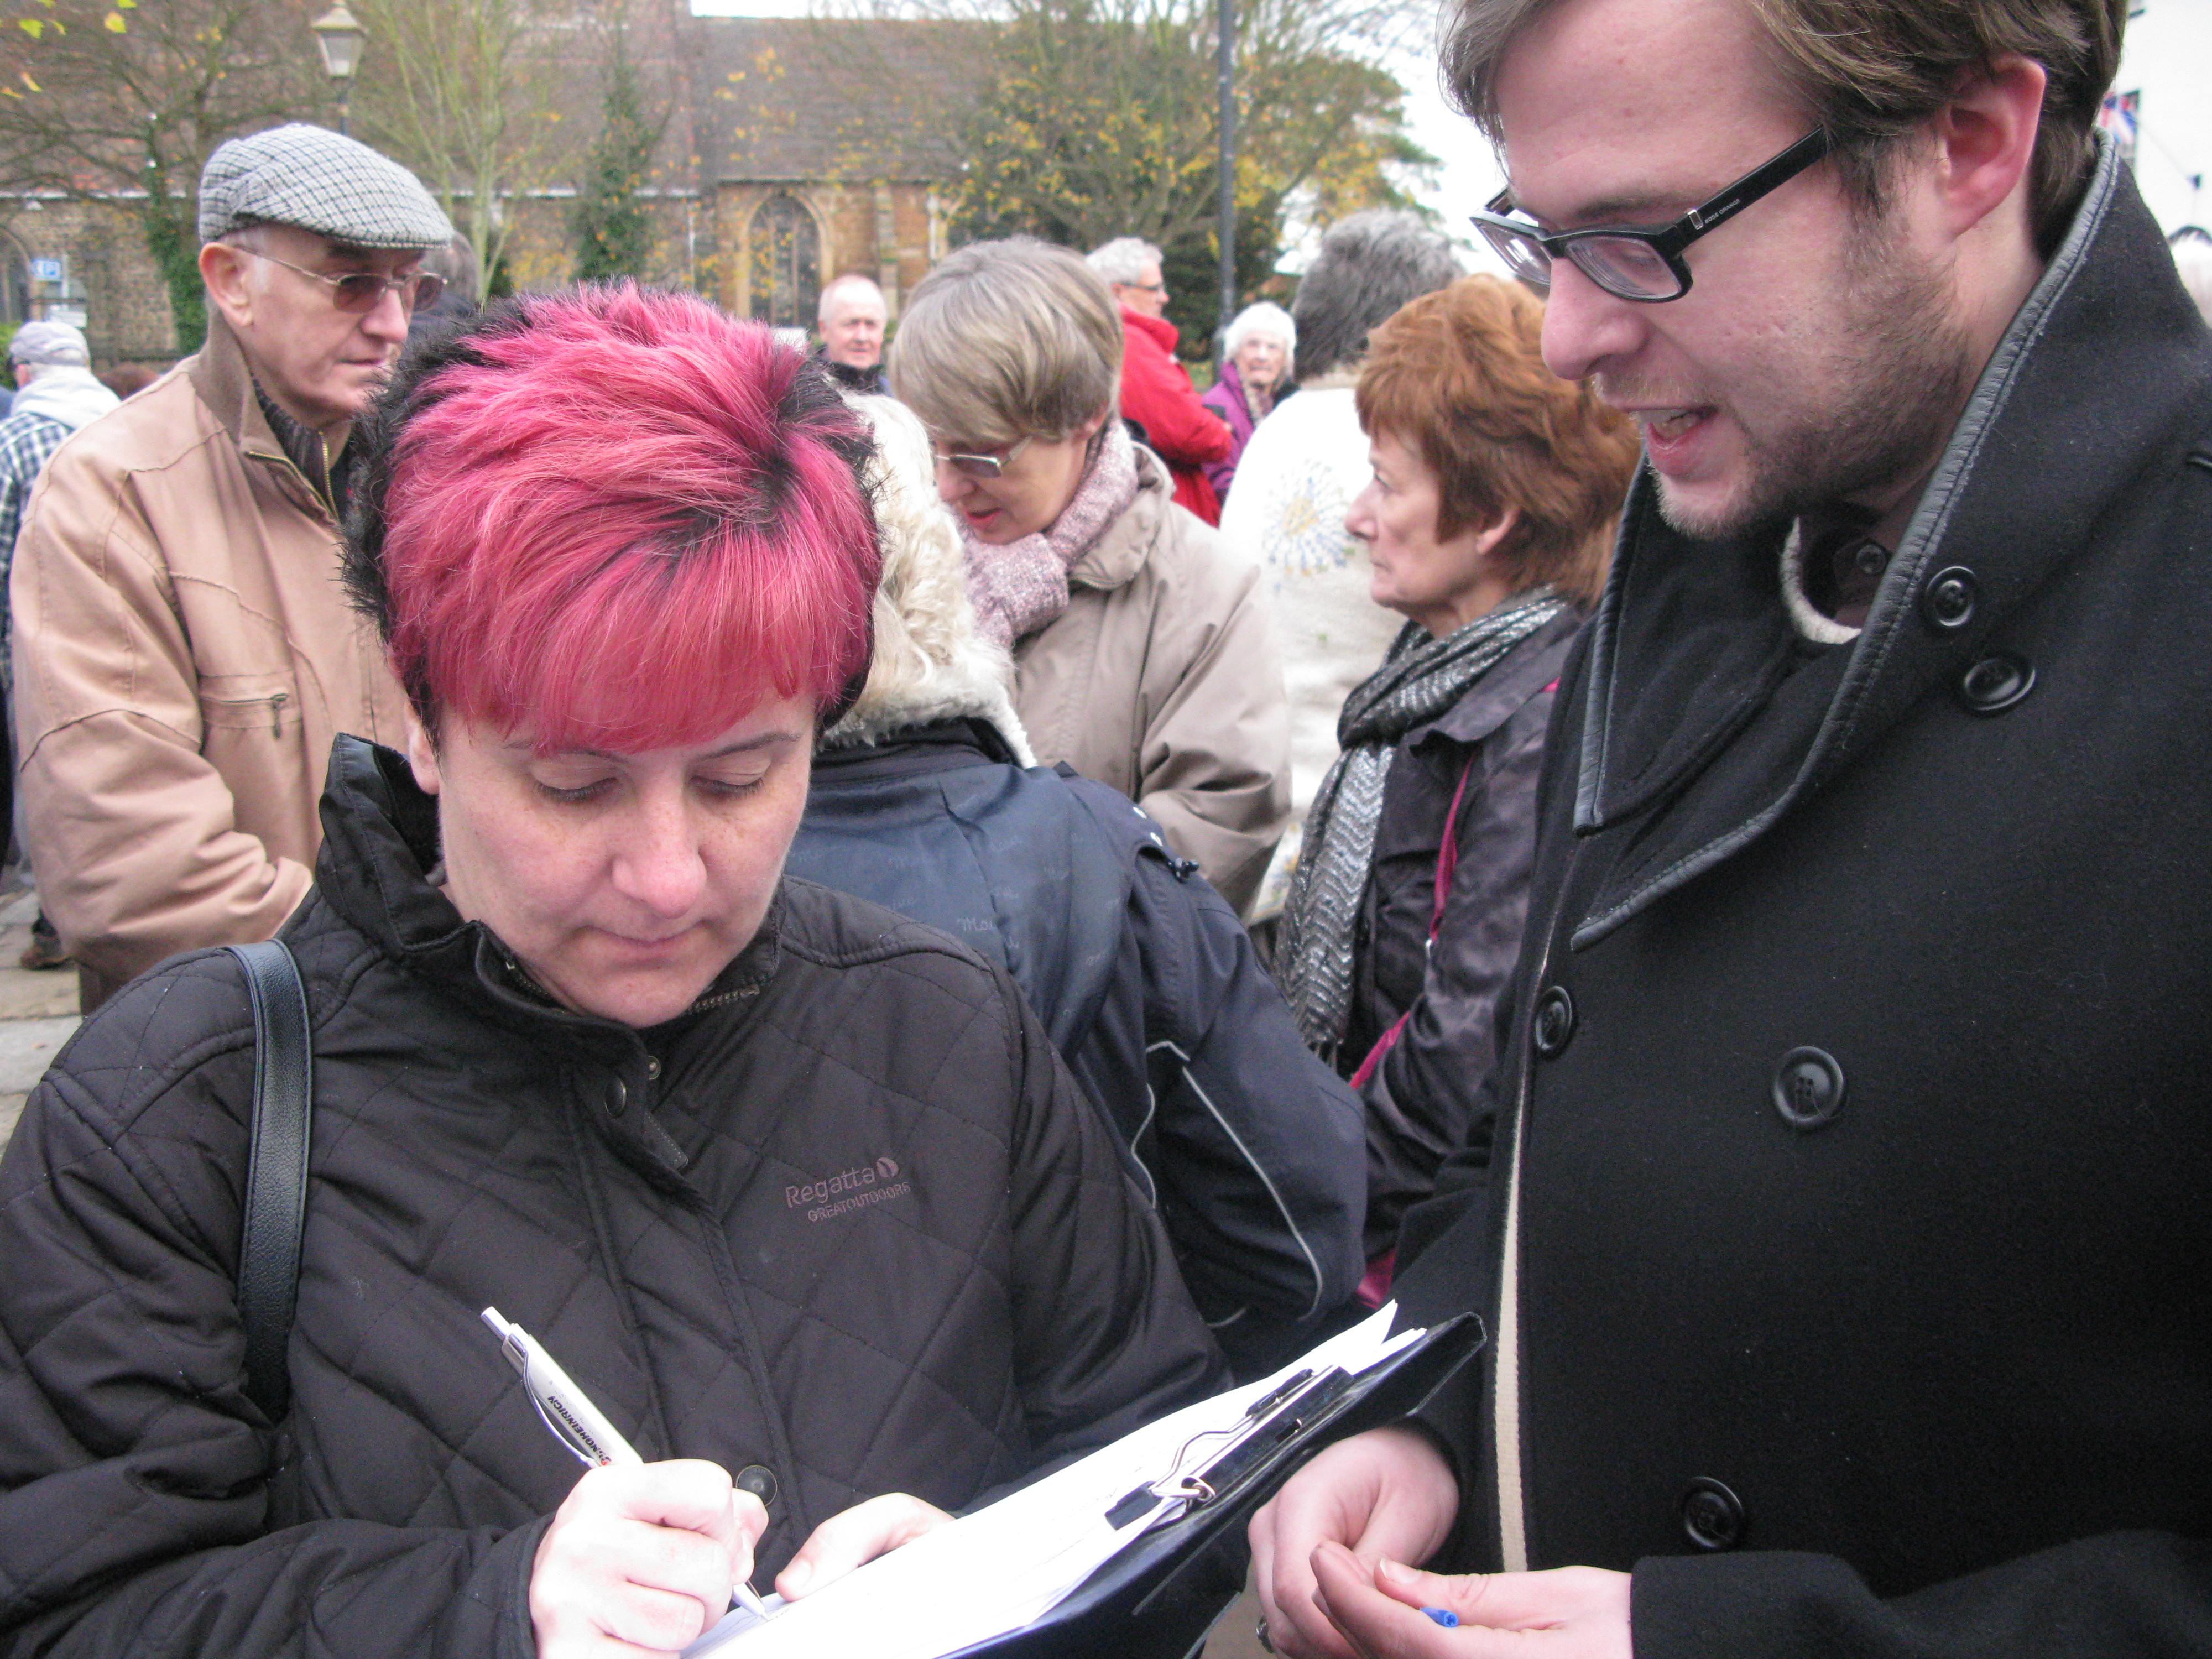 Chris_Clark_gathers_signatures.JPG